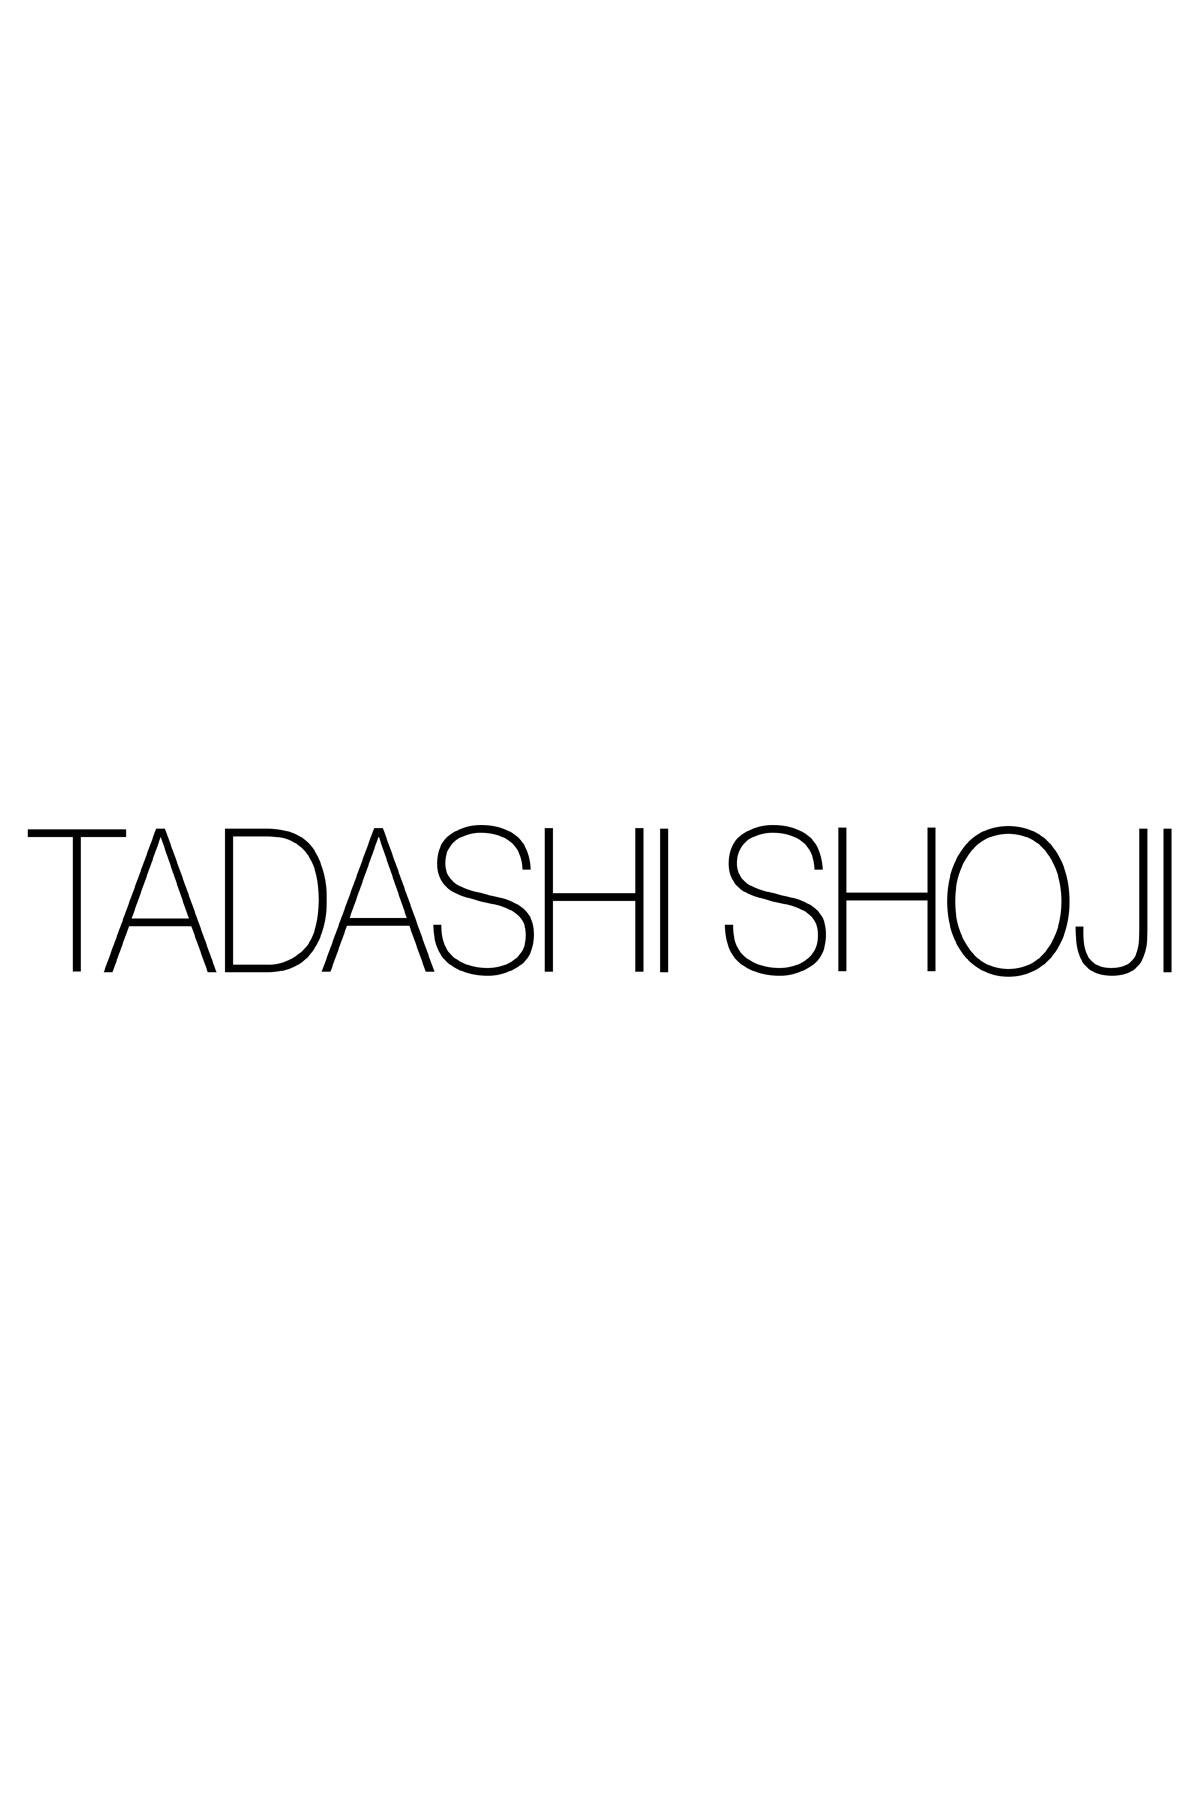 Tadashi Shoji Petite Size - Corded Embroidery on Tulle Cap Sleeve Dress